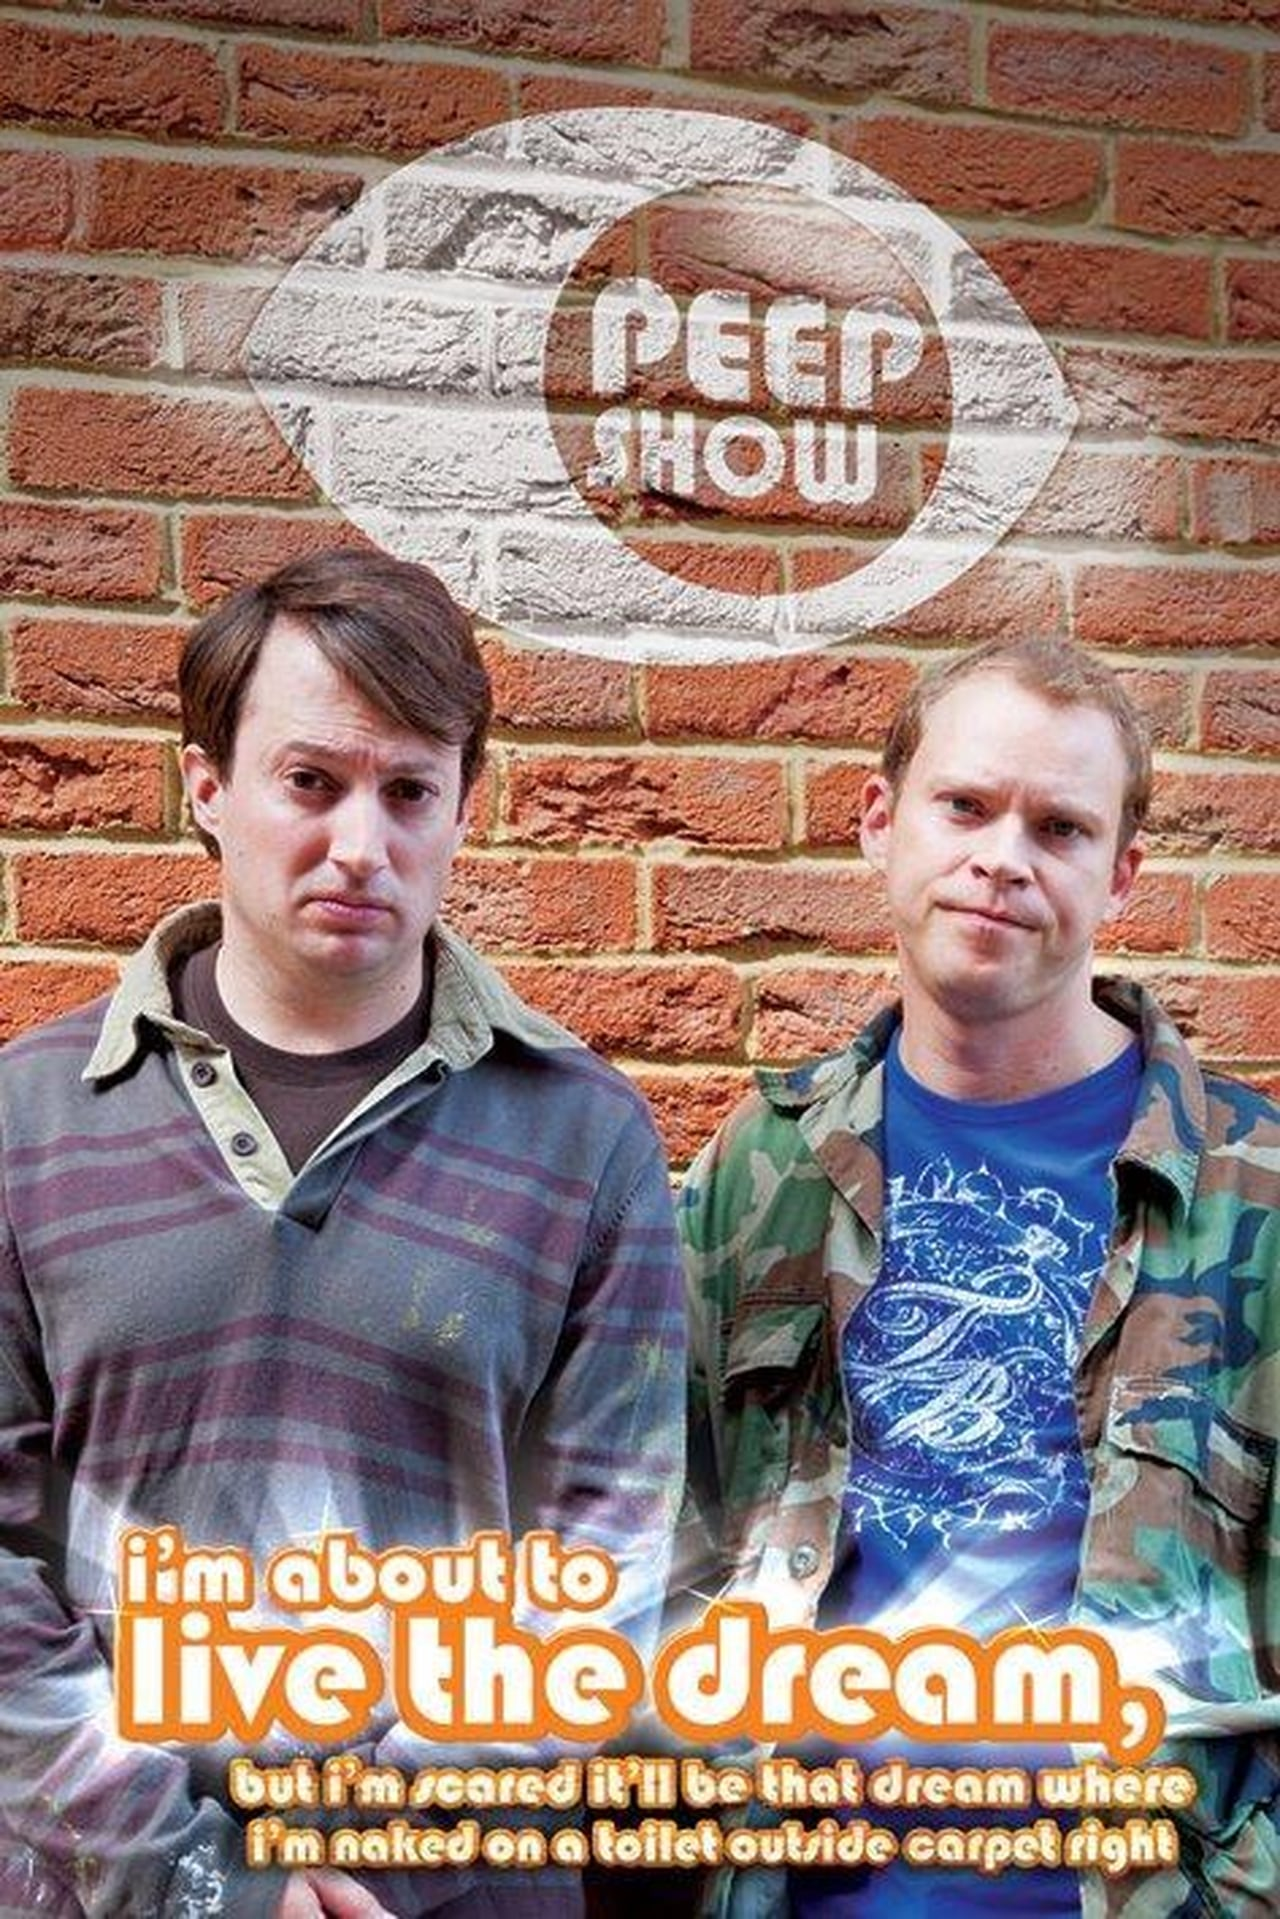 Putlocker Peep Show Season 7 (2010)